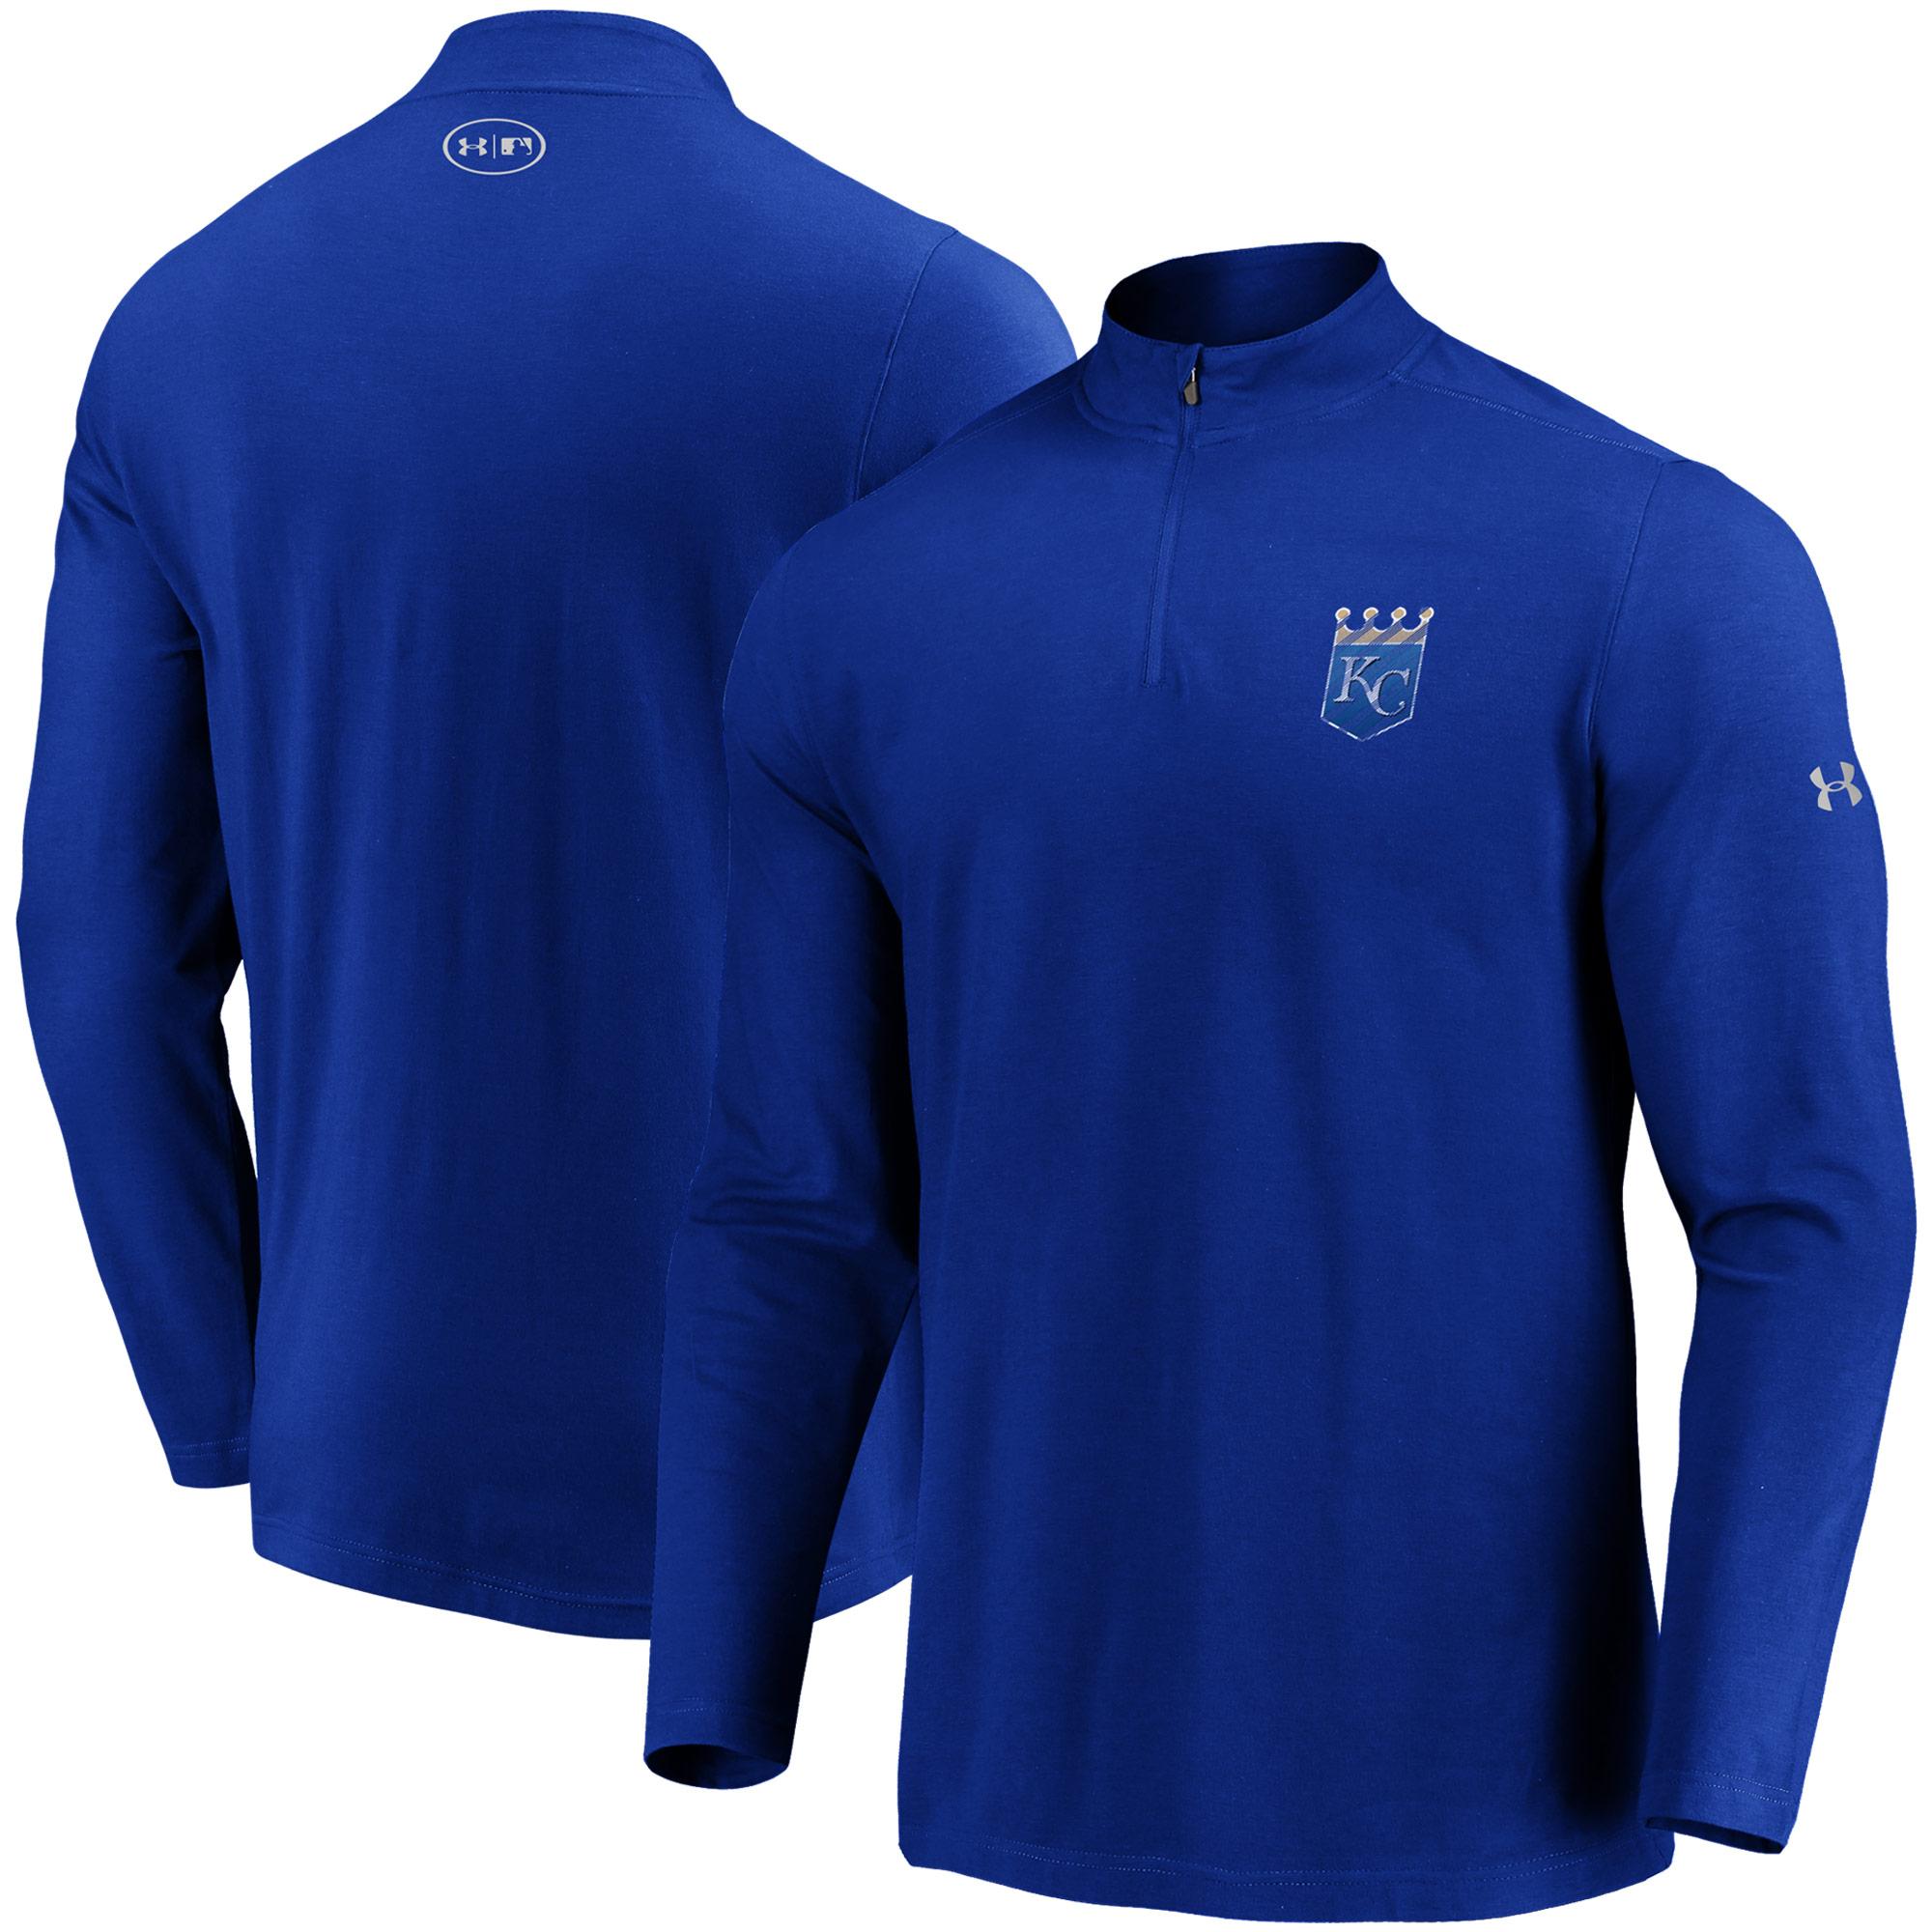 Kansas City Royals Under Armour Passion Alternate Left Chest 1/4-Zip Jacket - Royal